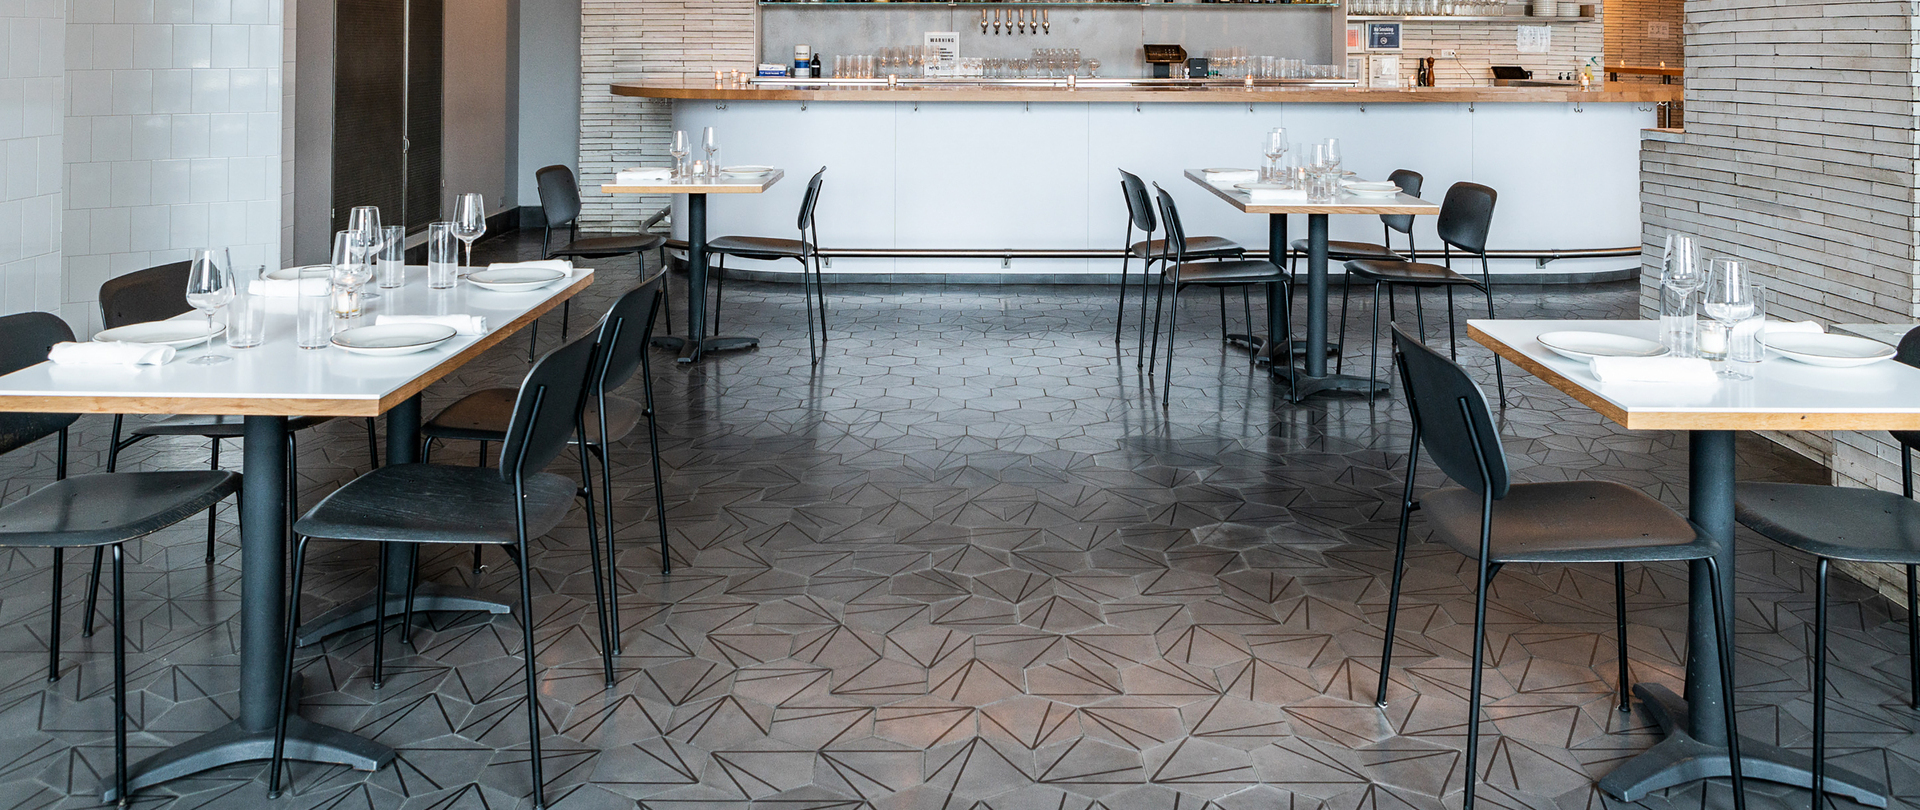 End of Season Cement Tile Sale, from Villa Lagoon Tile.